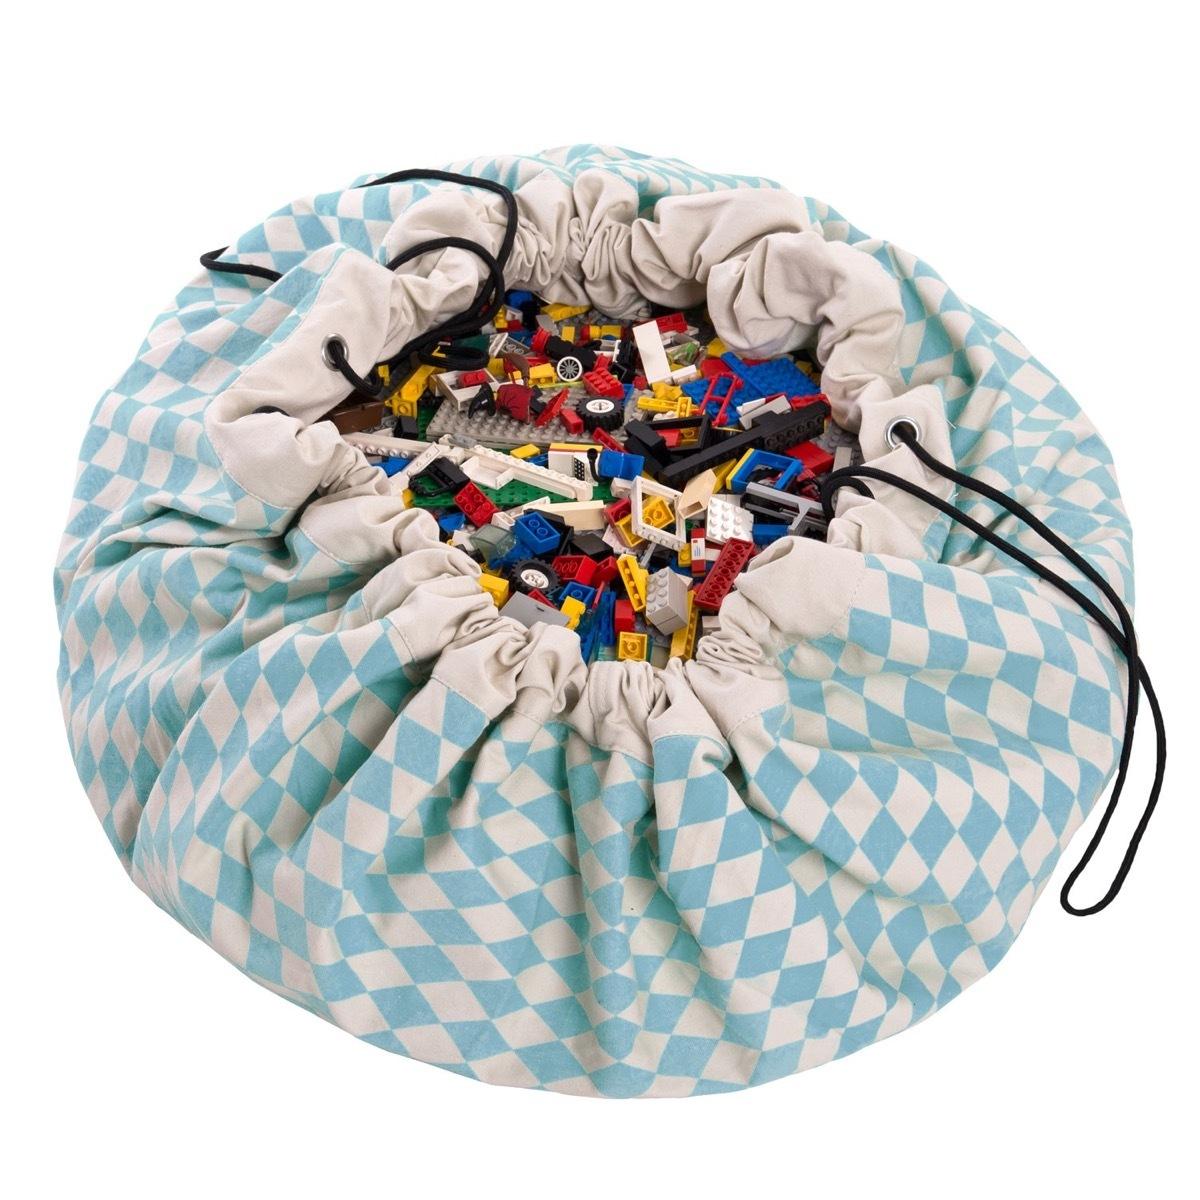 Коврик-мешок для игрушек Play&Go. Коллекция Print. Синий бриллиант